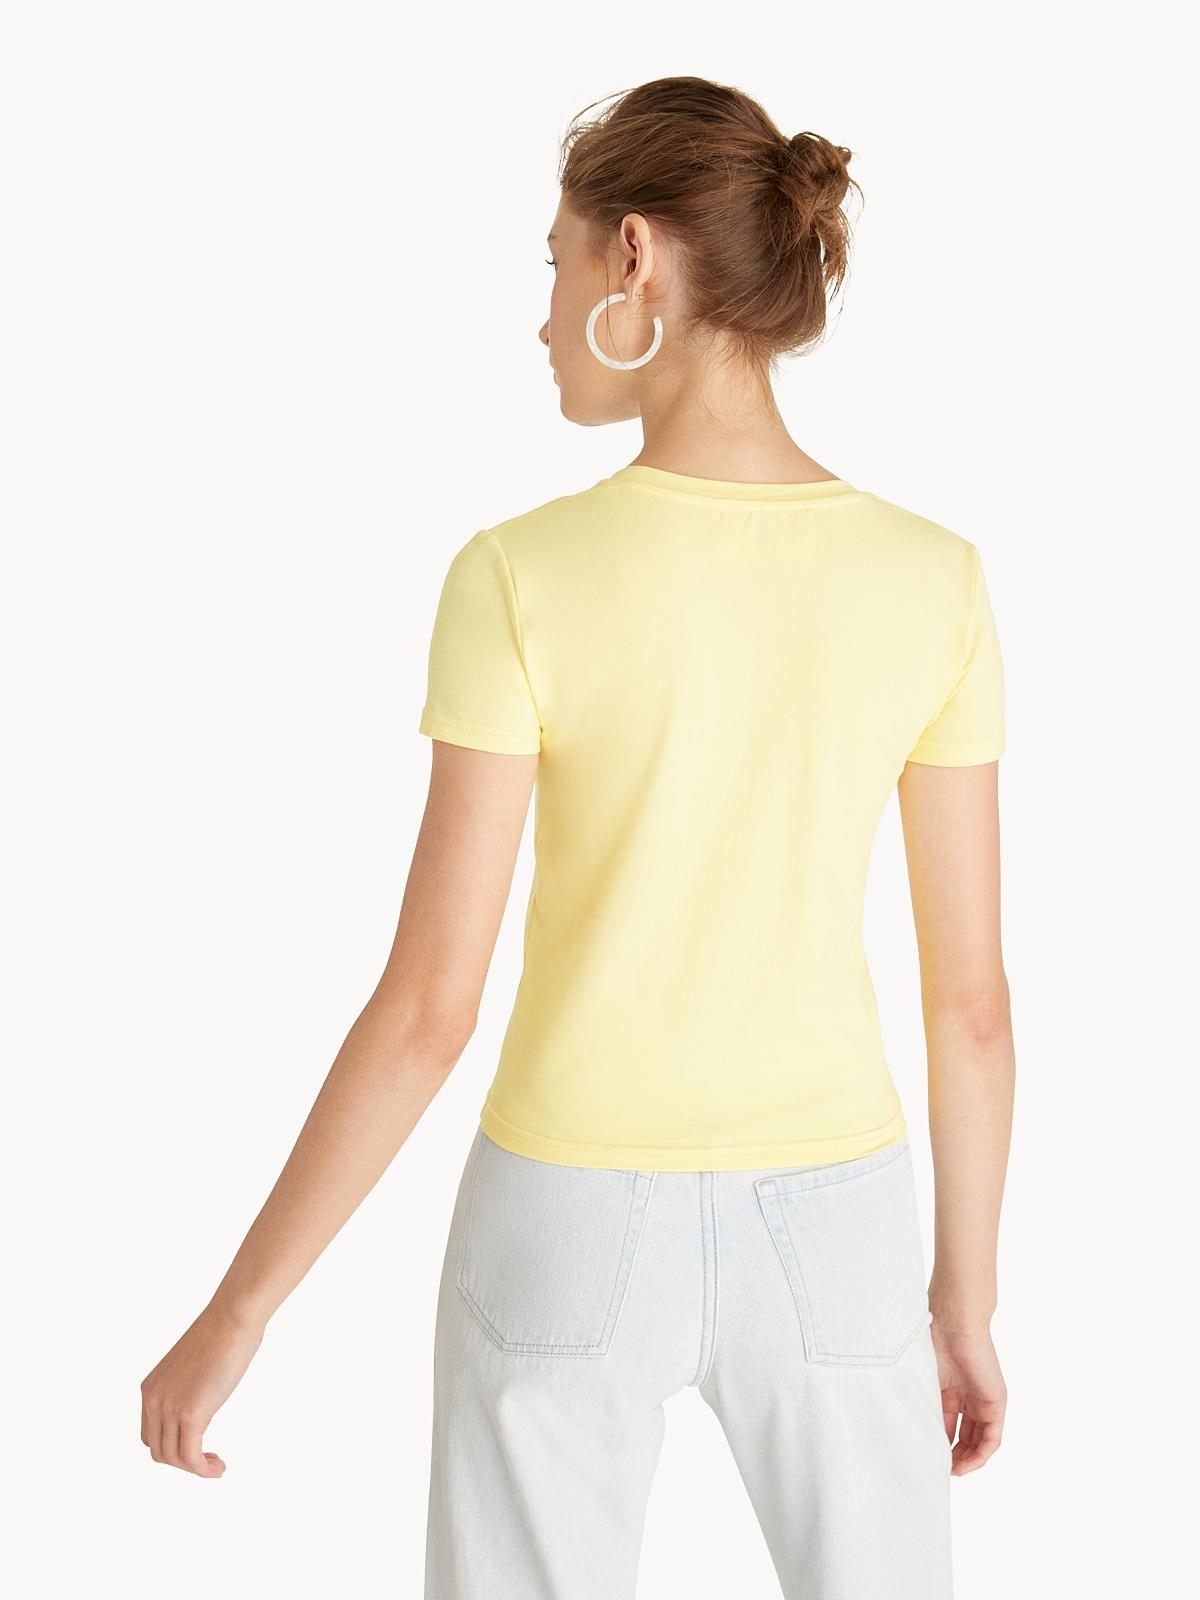 Round Neck Tee Yellow